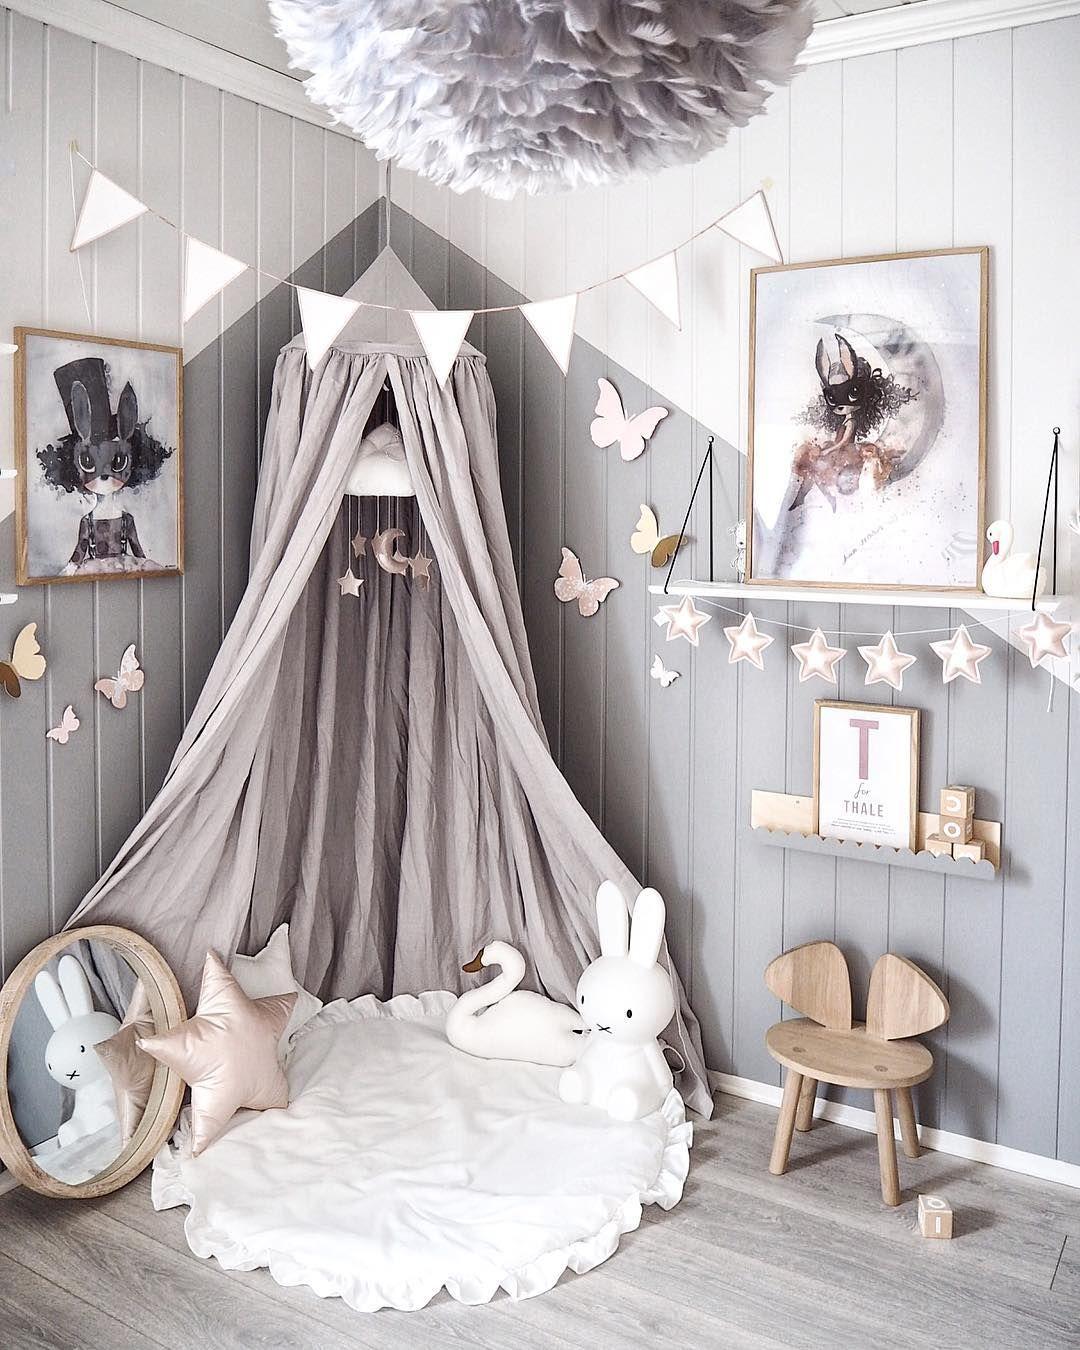 Miffy kidsroom